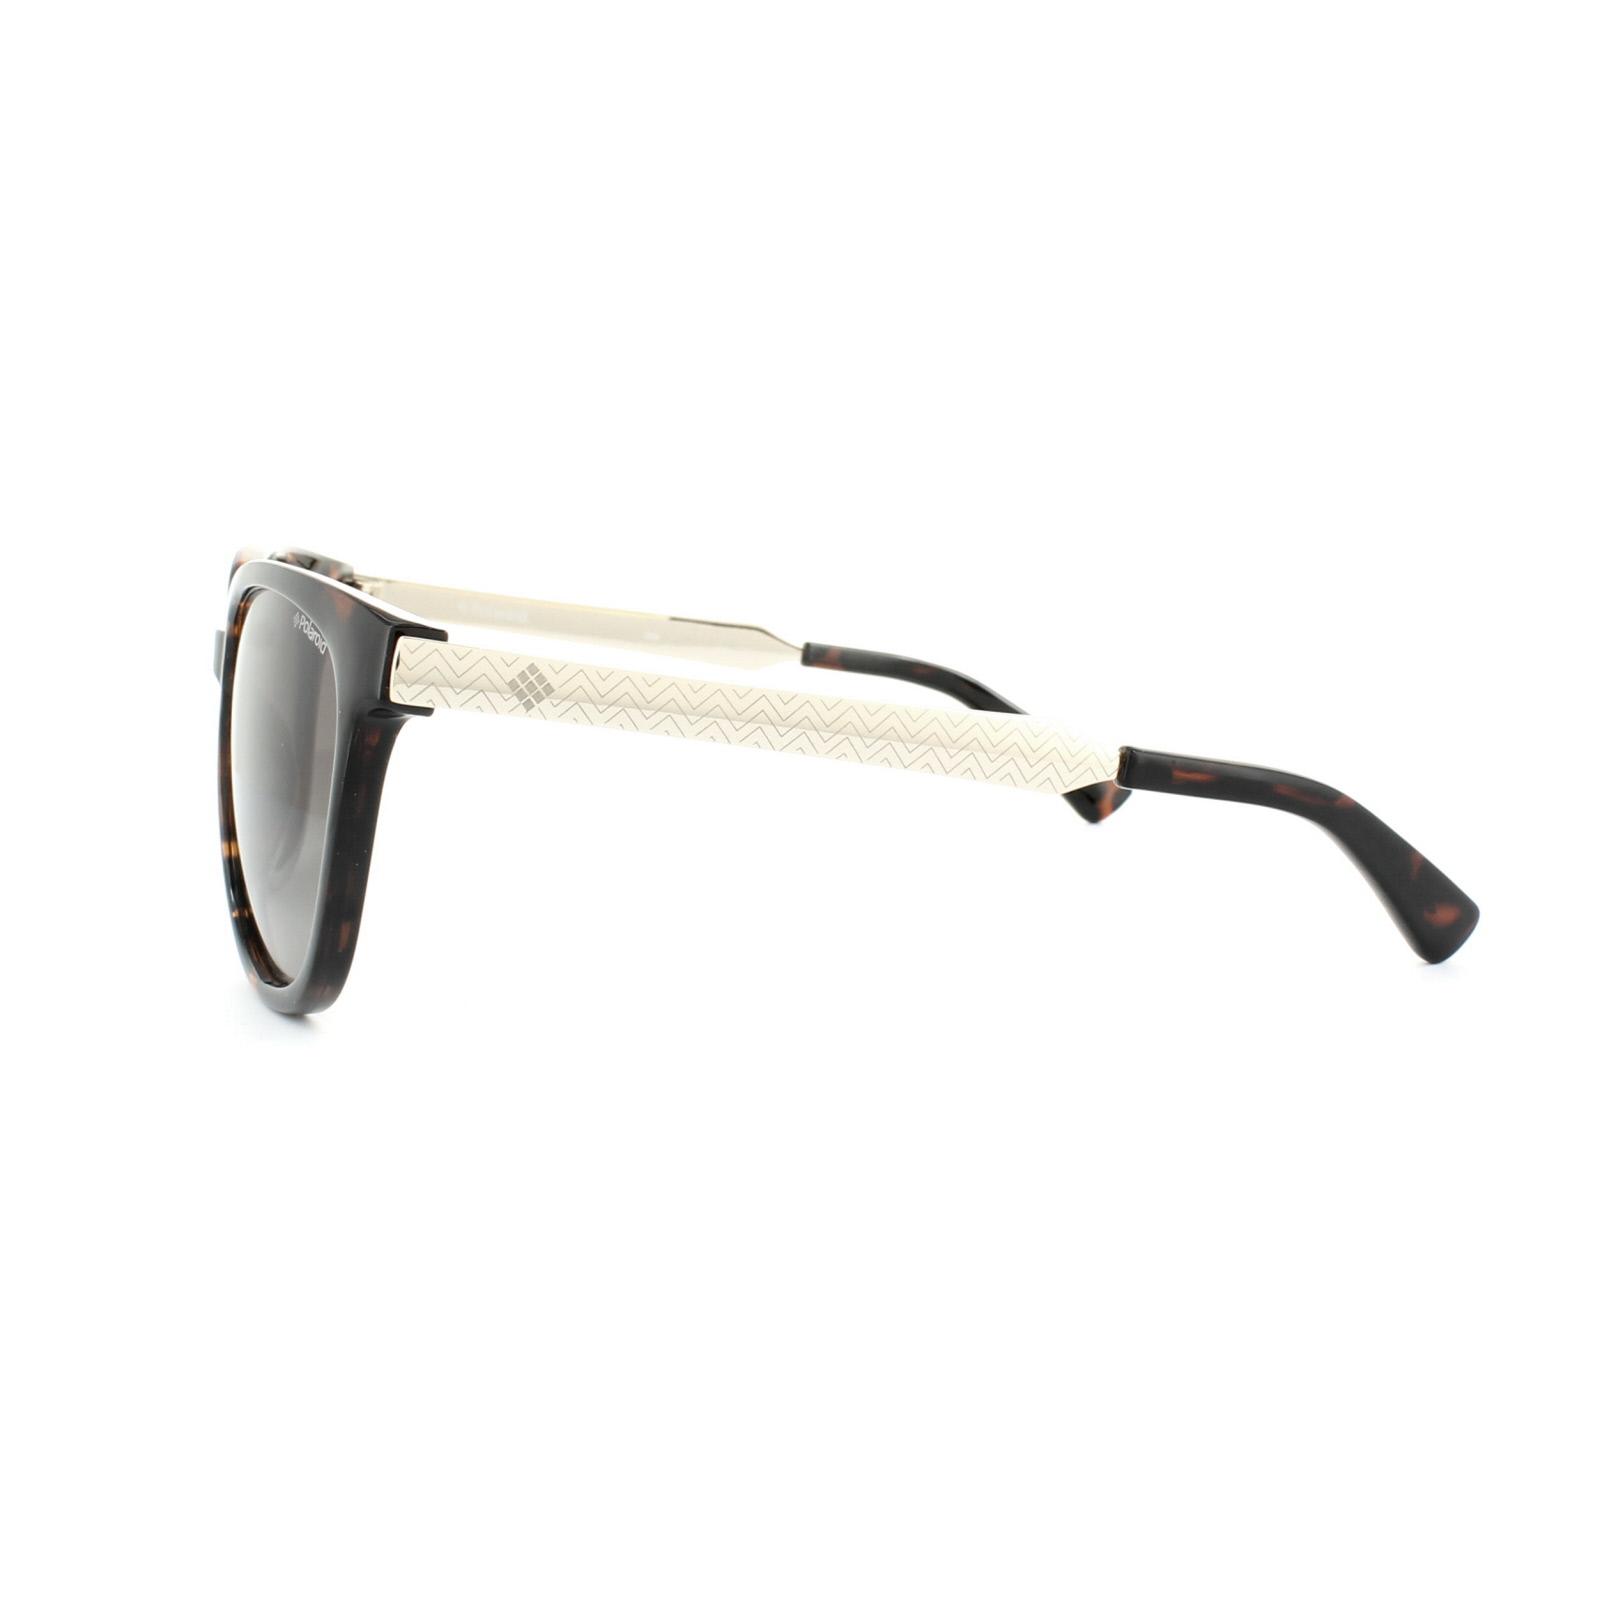 50d4aa0ce Sentinel Polaroid Sunglasses 5015/S LLY 94 Havana Gold Brown Polarized